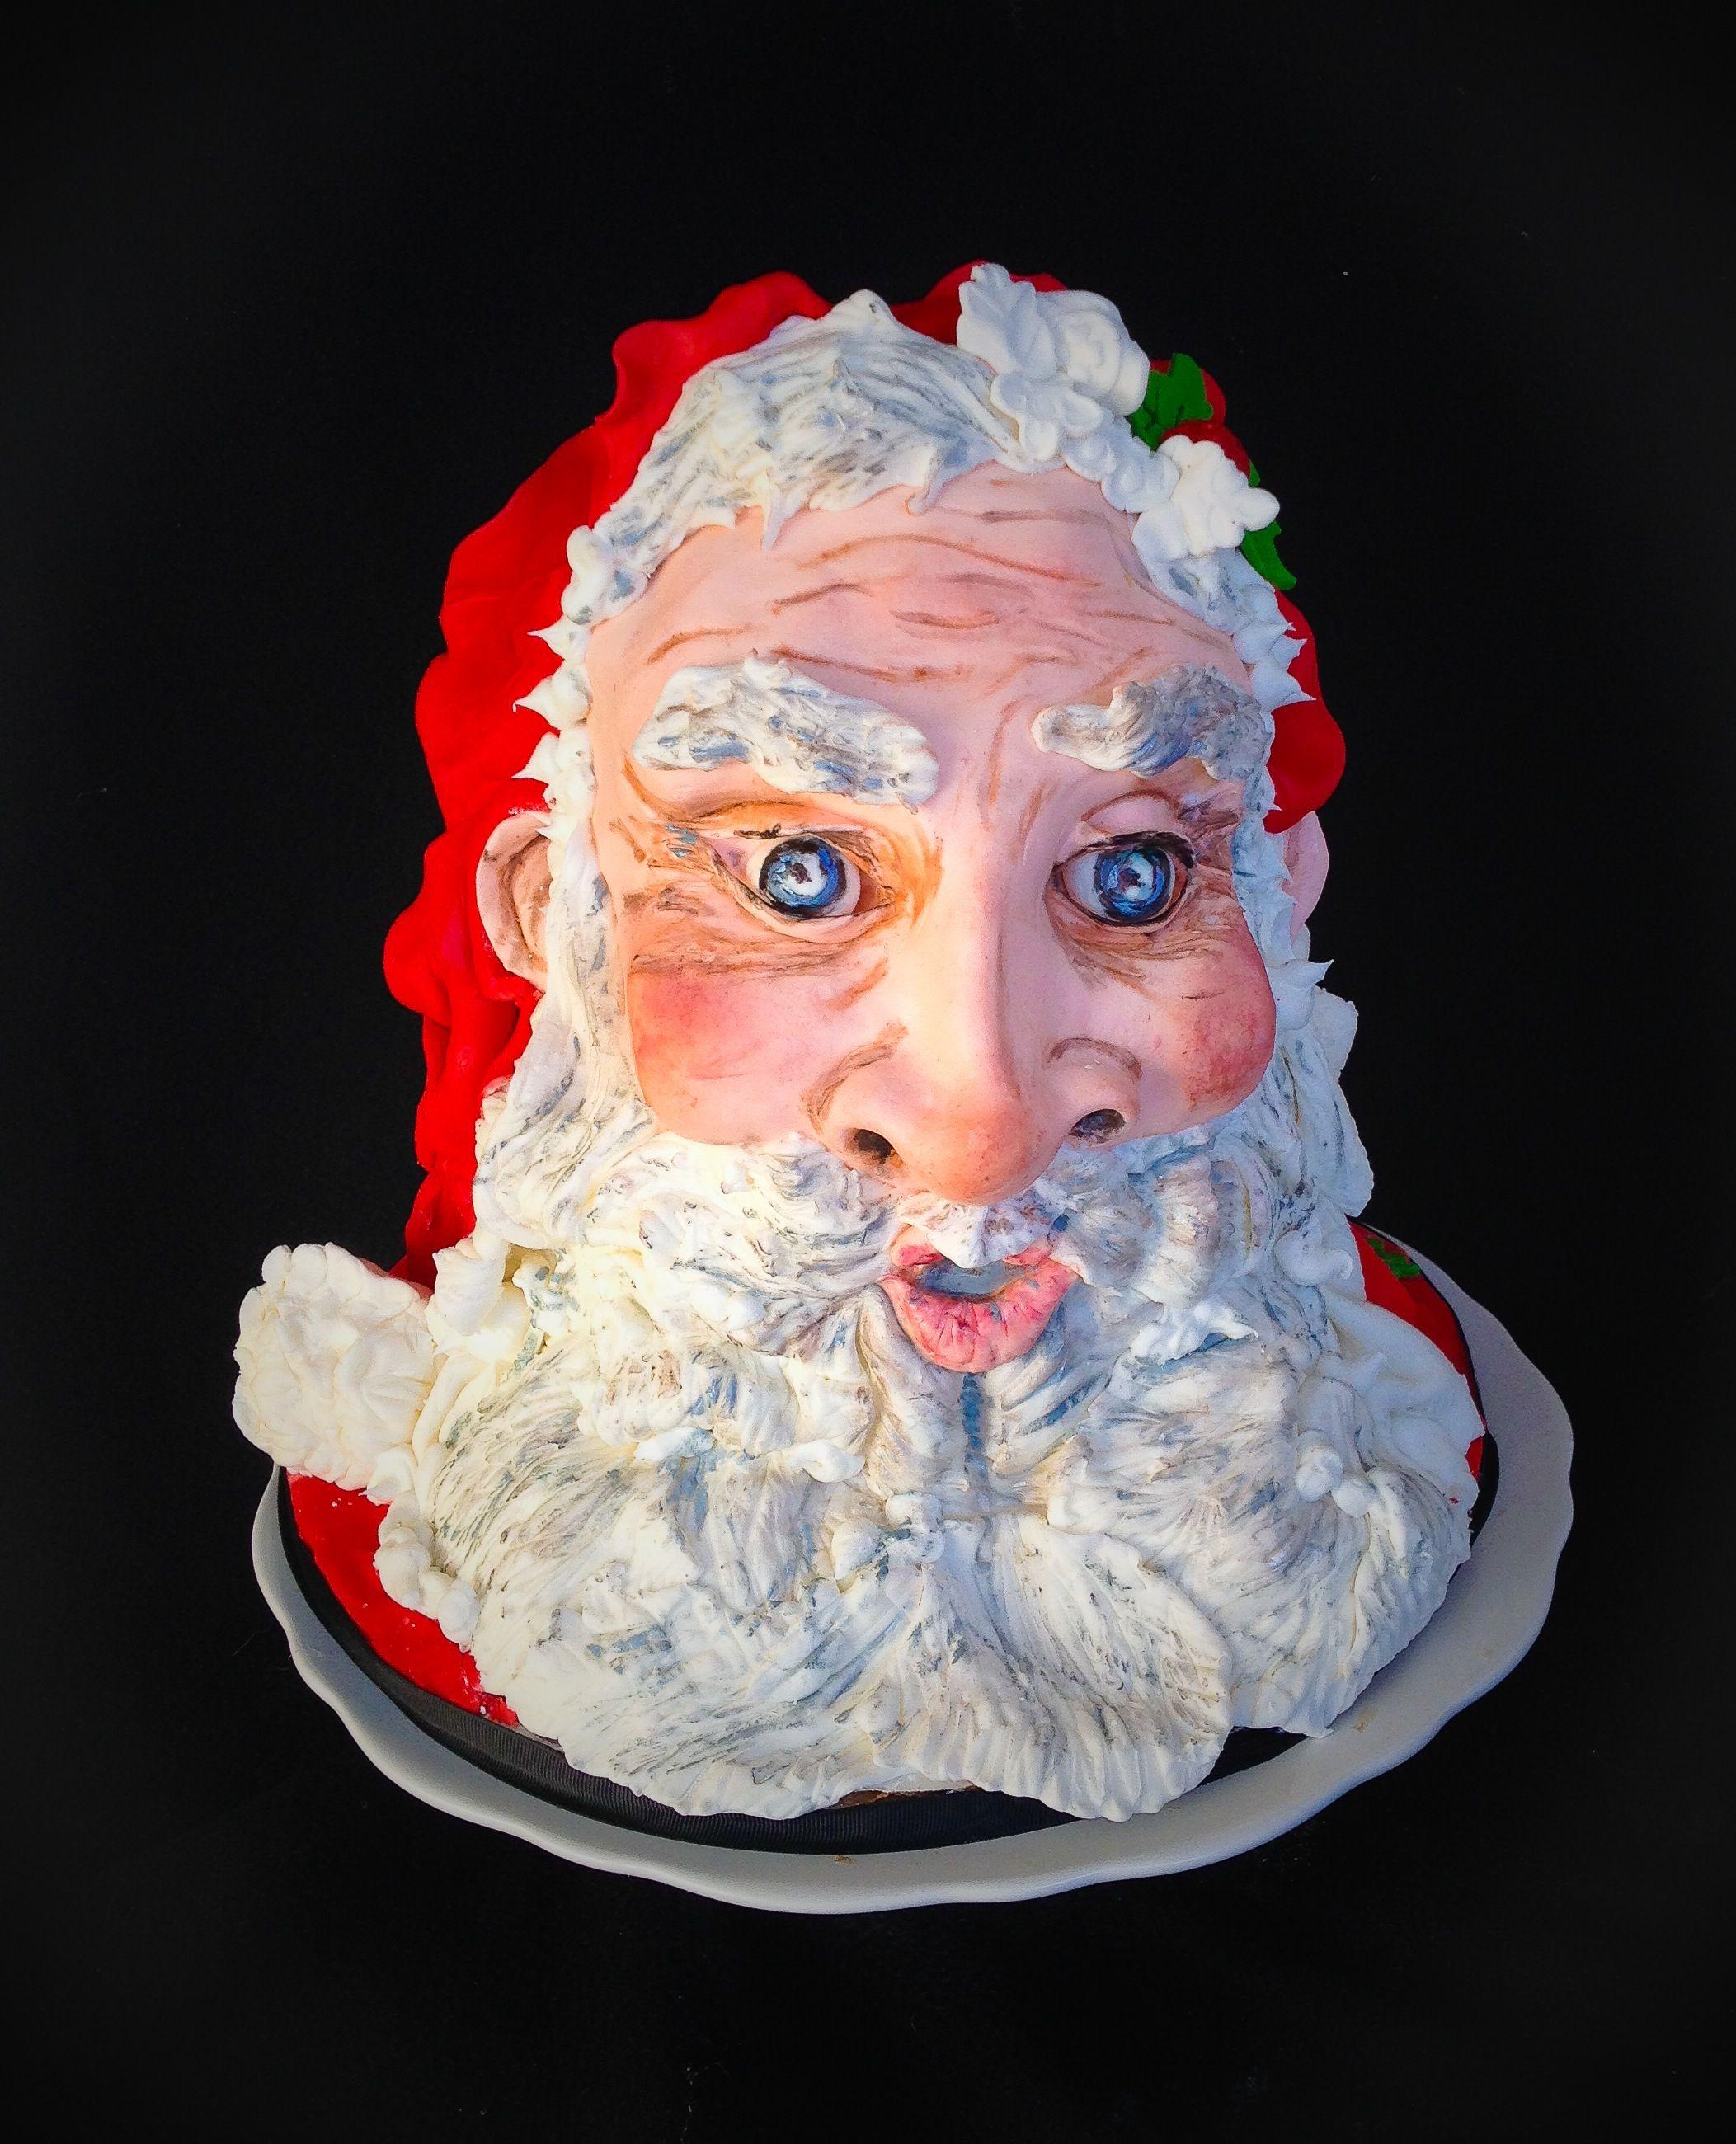 Santa Cake Christmas Cake 3d Sculpted Www Sweet Samantha Com Santa Cake Sculpting Christmas Cake